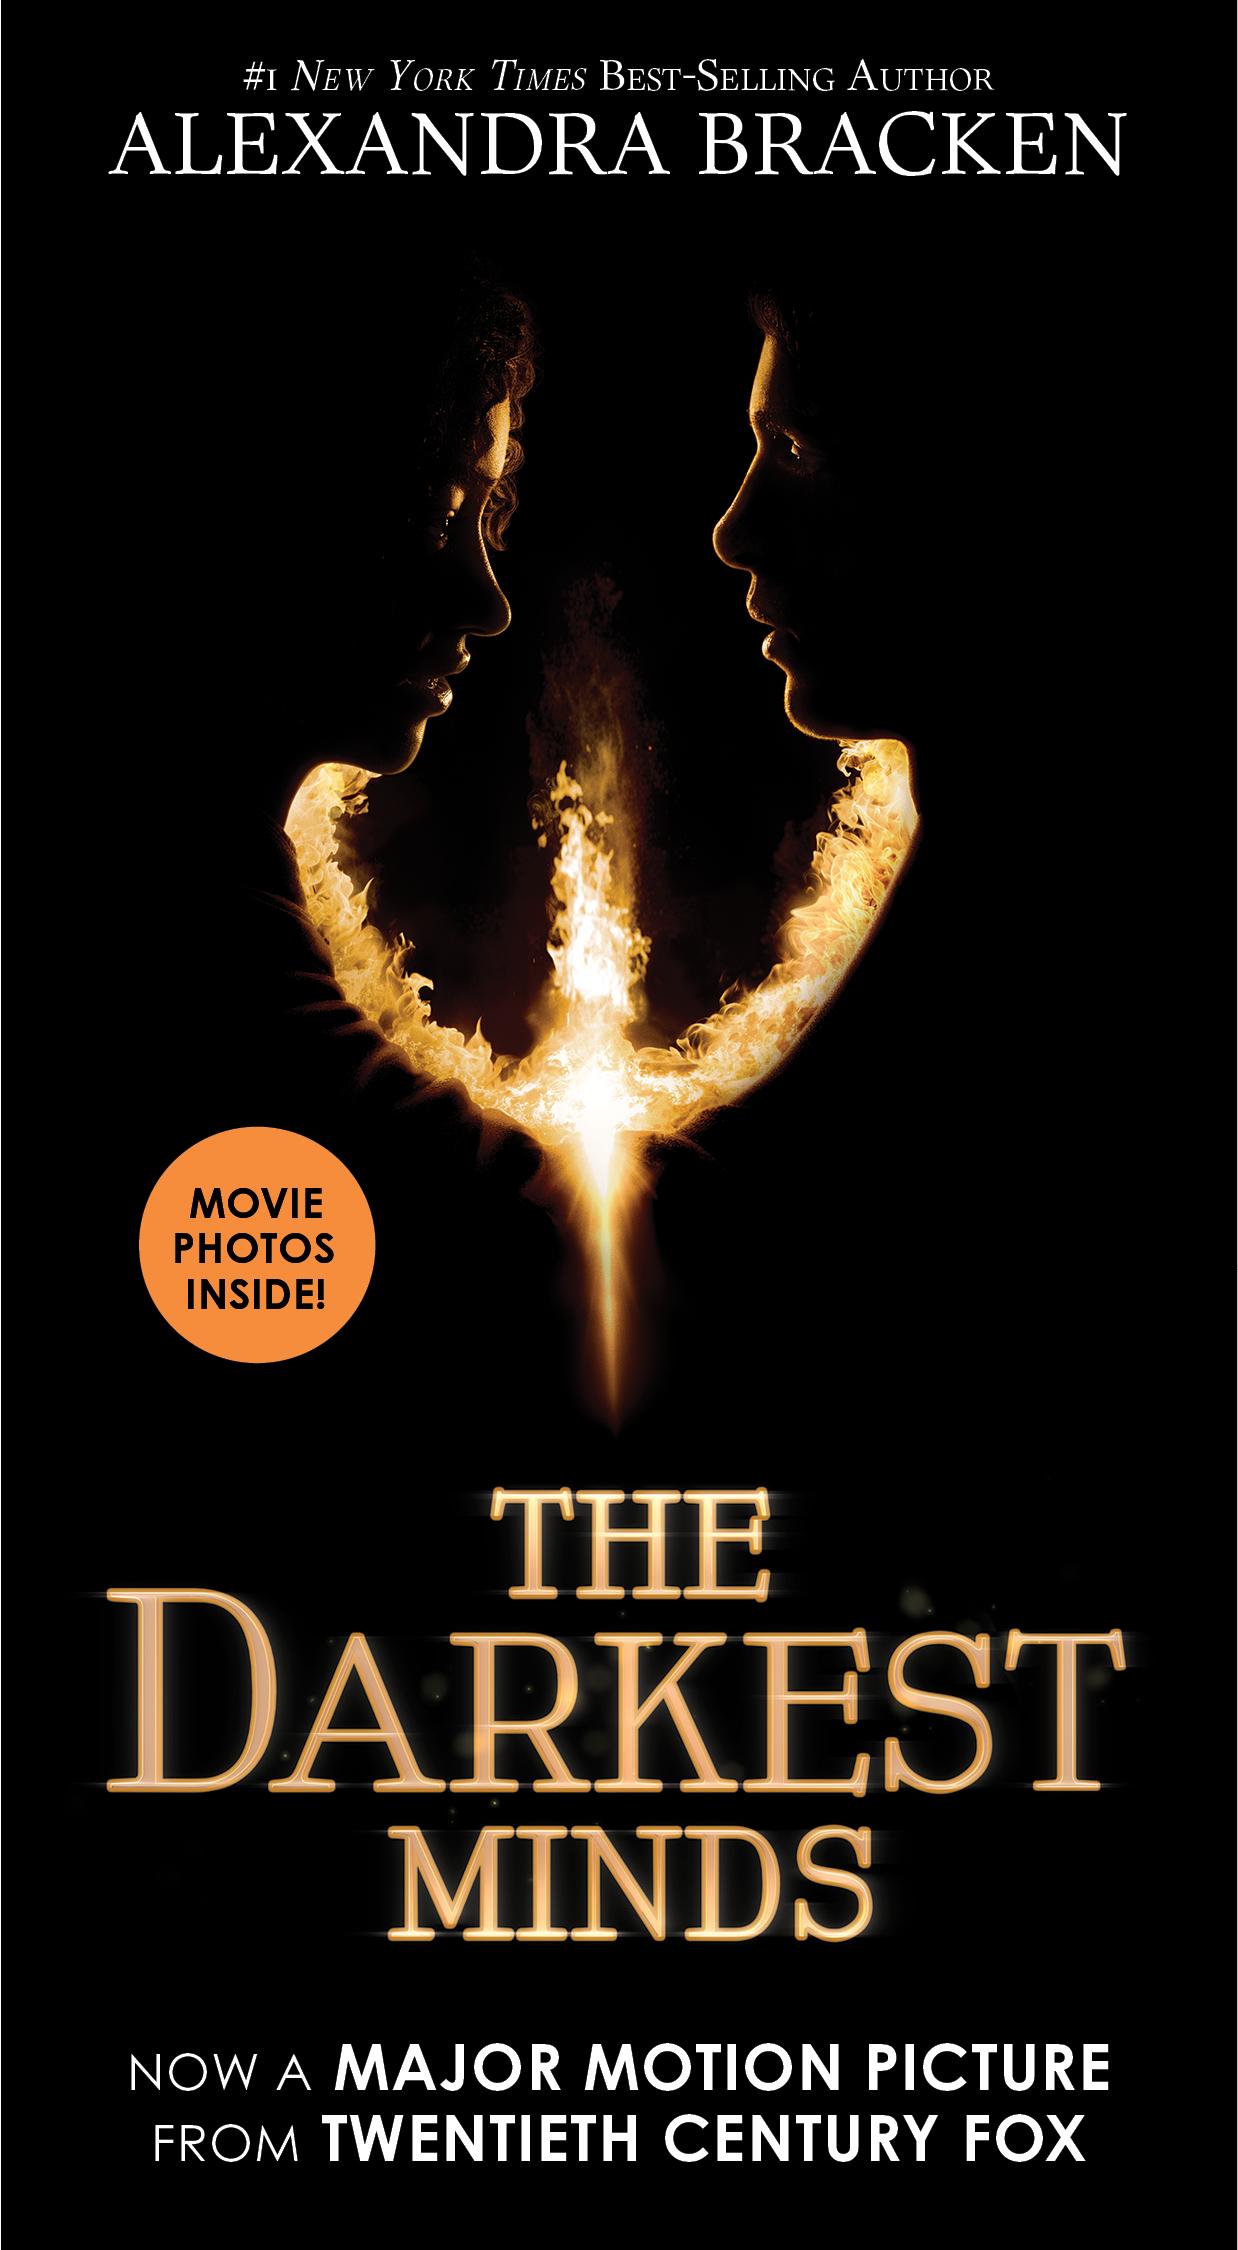 the darkest minds movie editions alexandra bracken